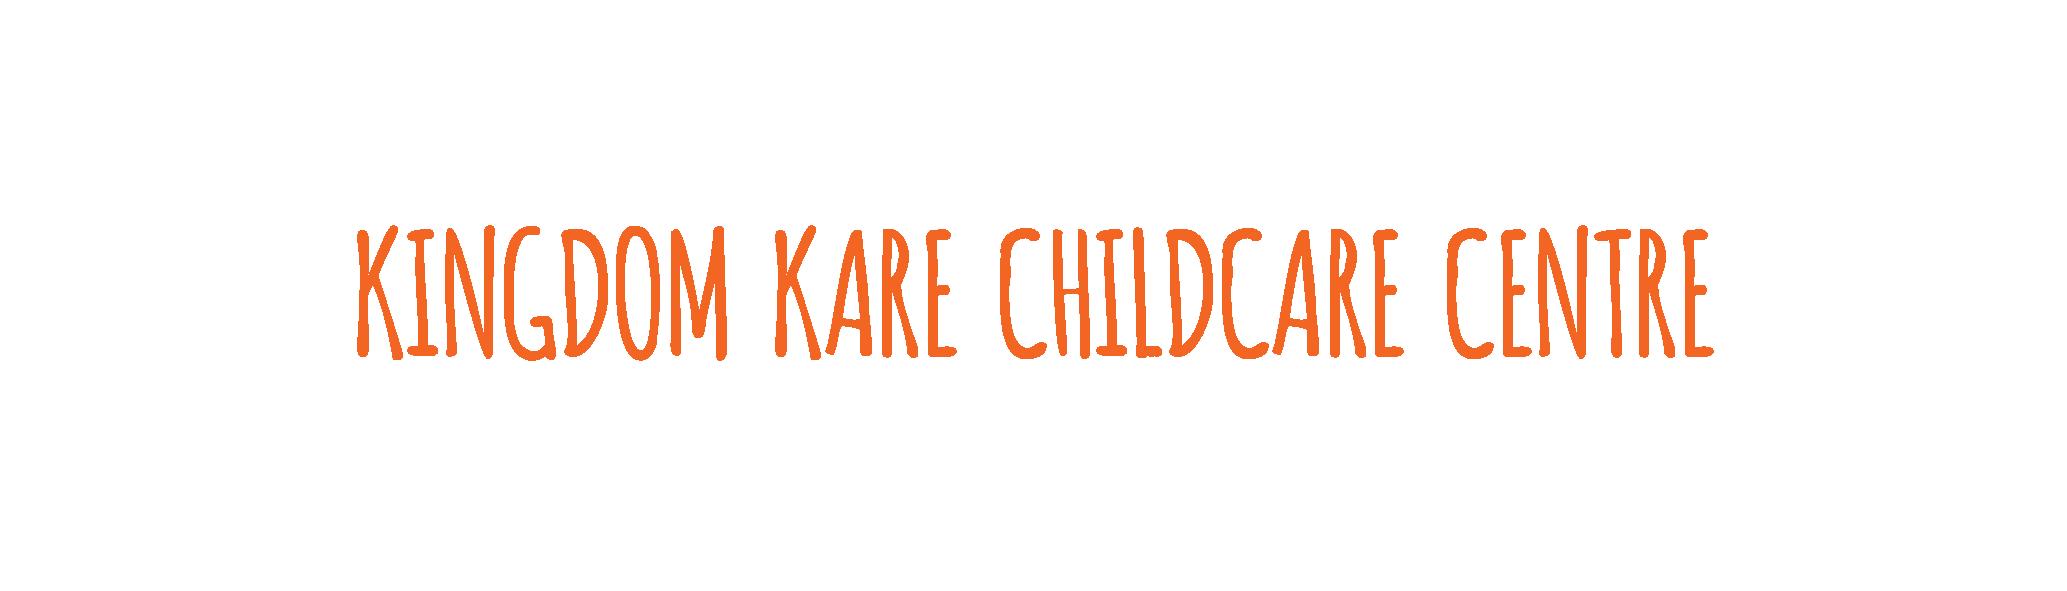 Kingdom-Kare-Childcare-Centre-Rotating-Header4.png